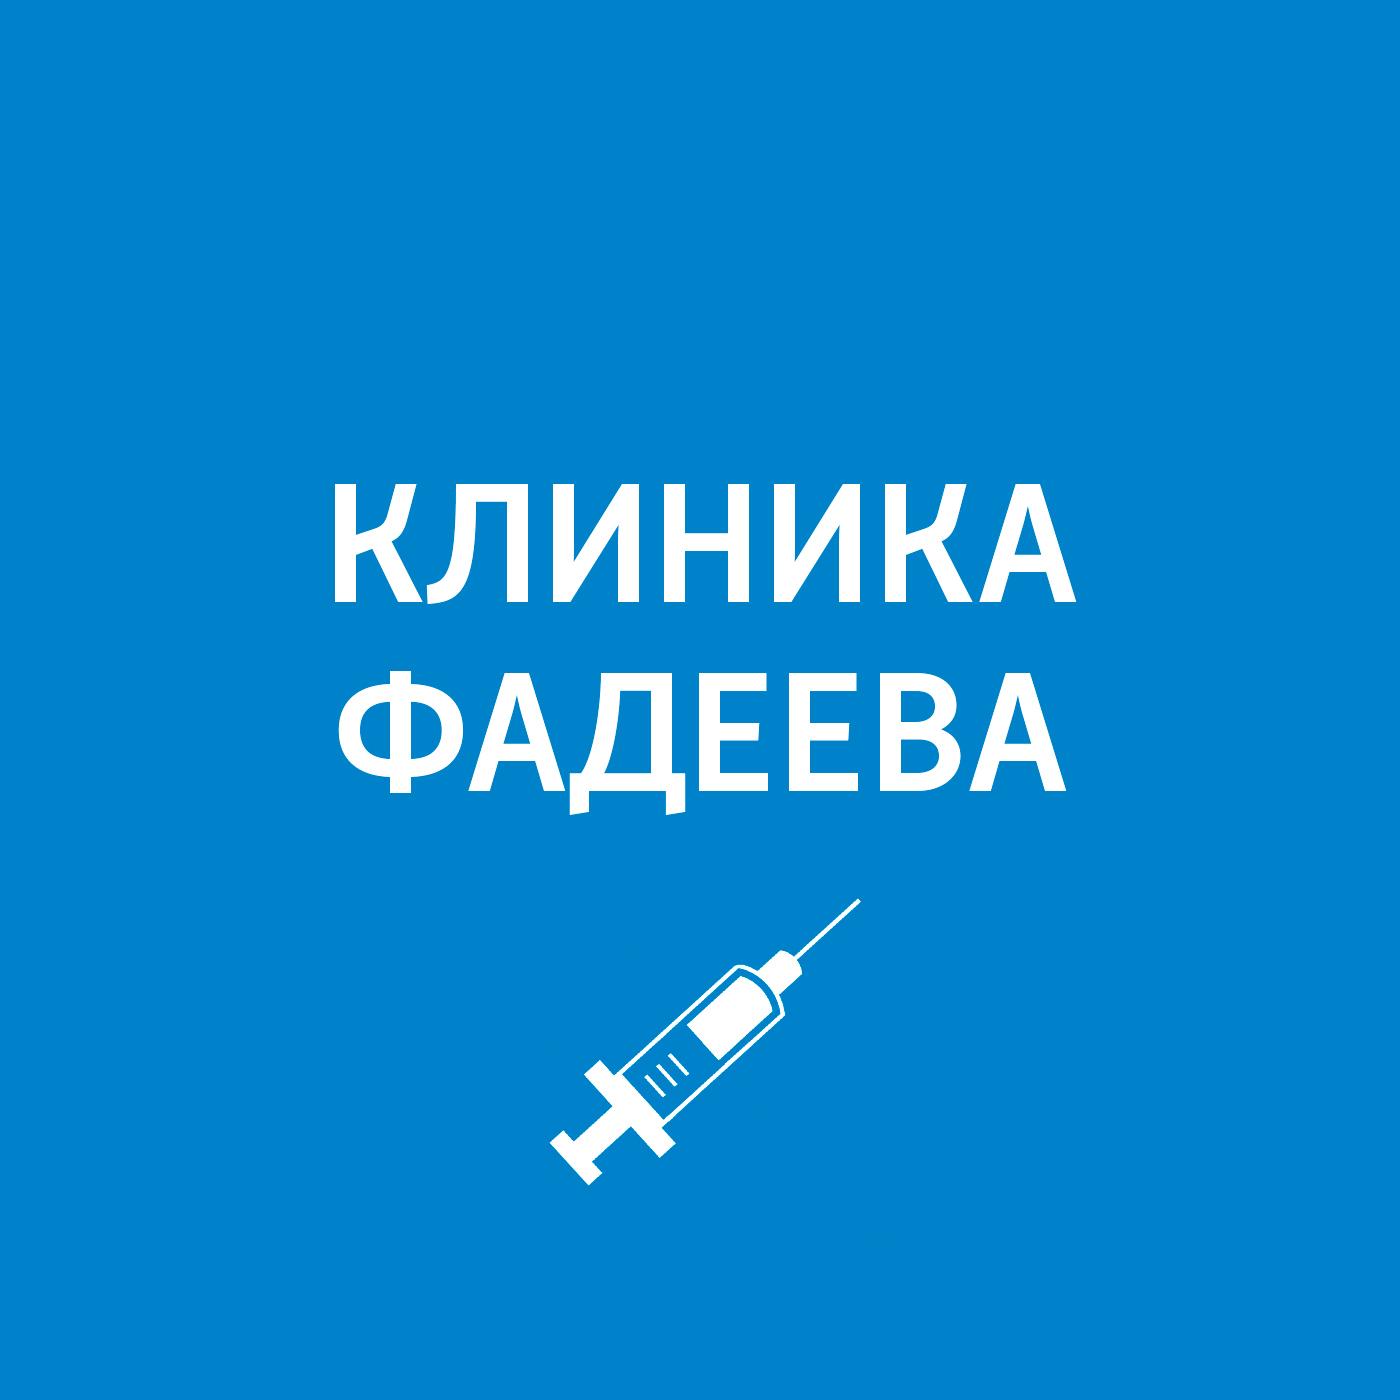 Пётр Фадеев Мотогонки пётр фадеев кинезиолог остеопат